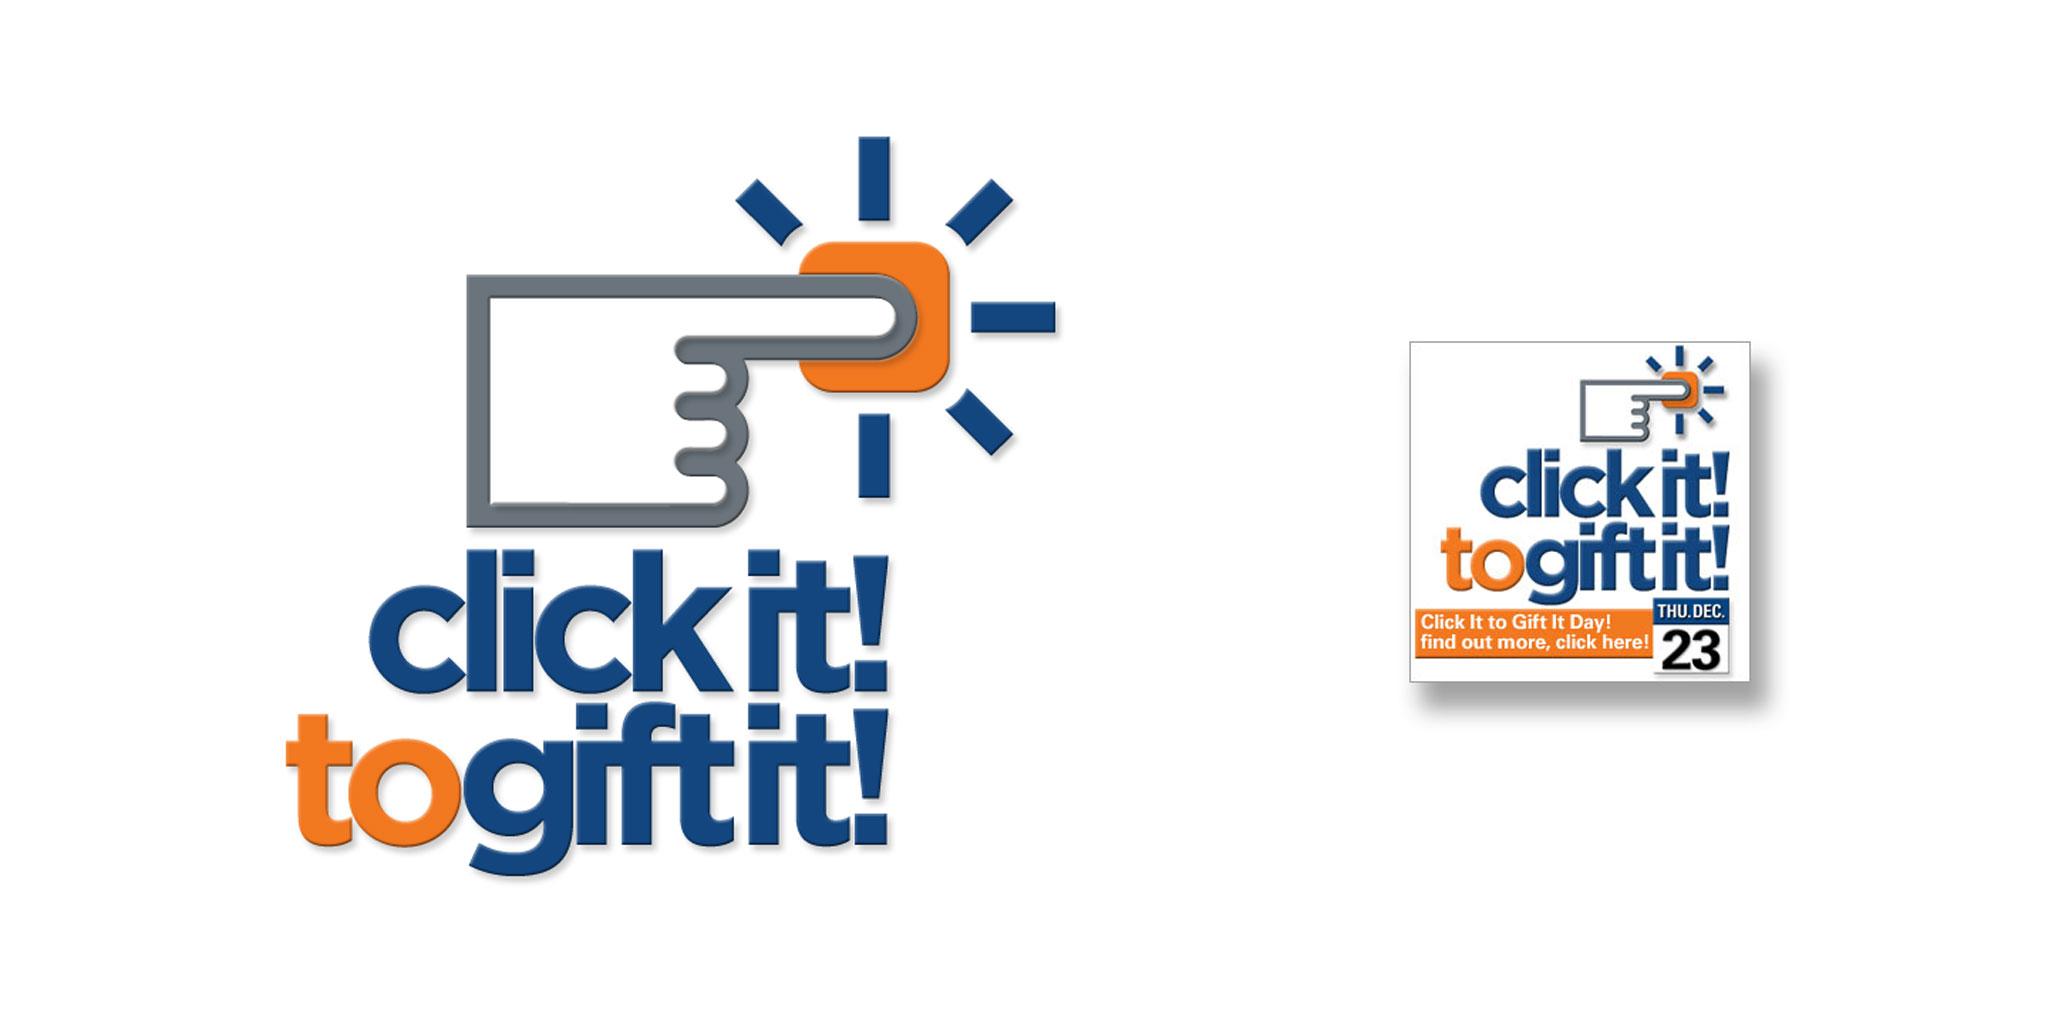 CITGI_logo_1024.jpg